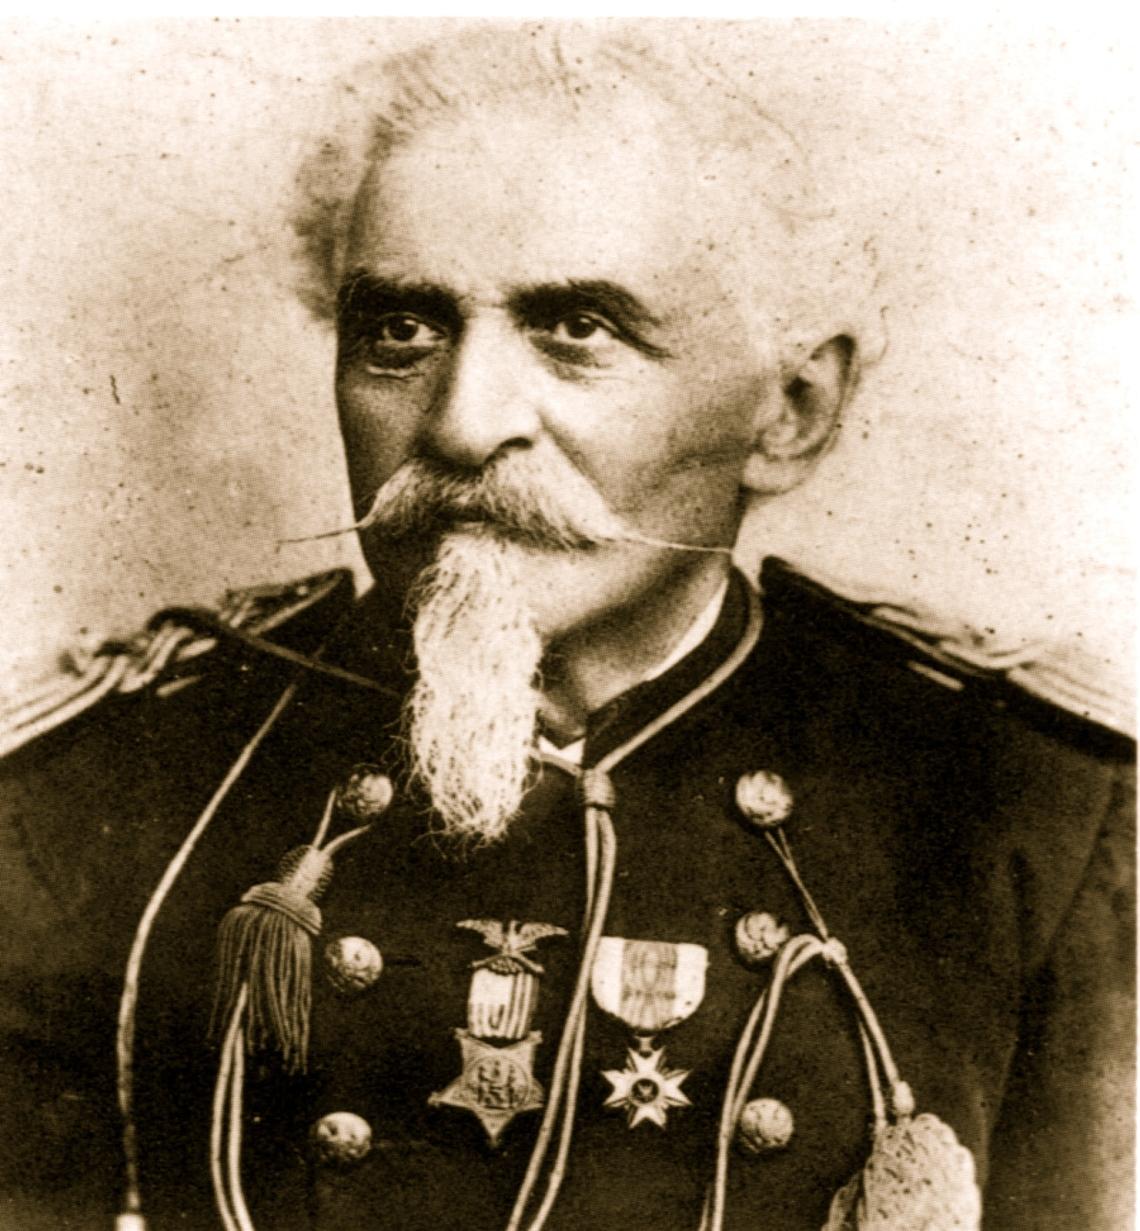 Carlo Rudio